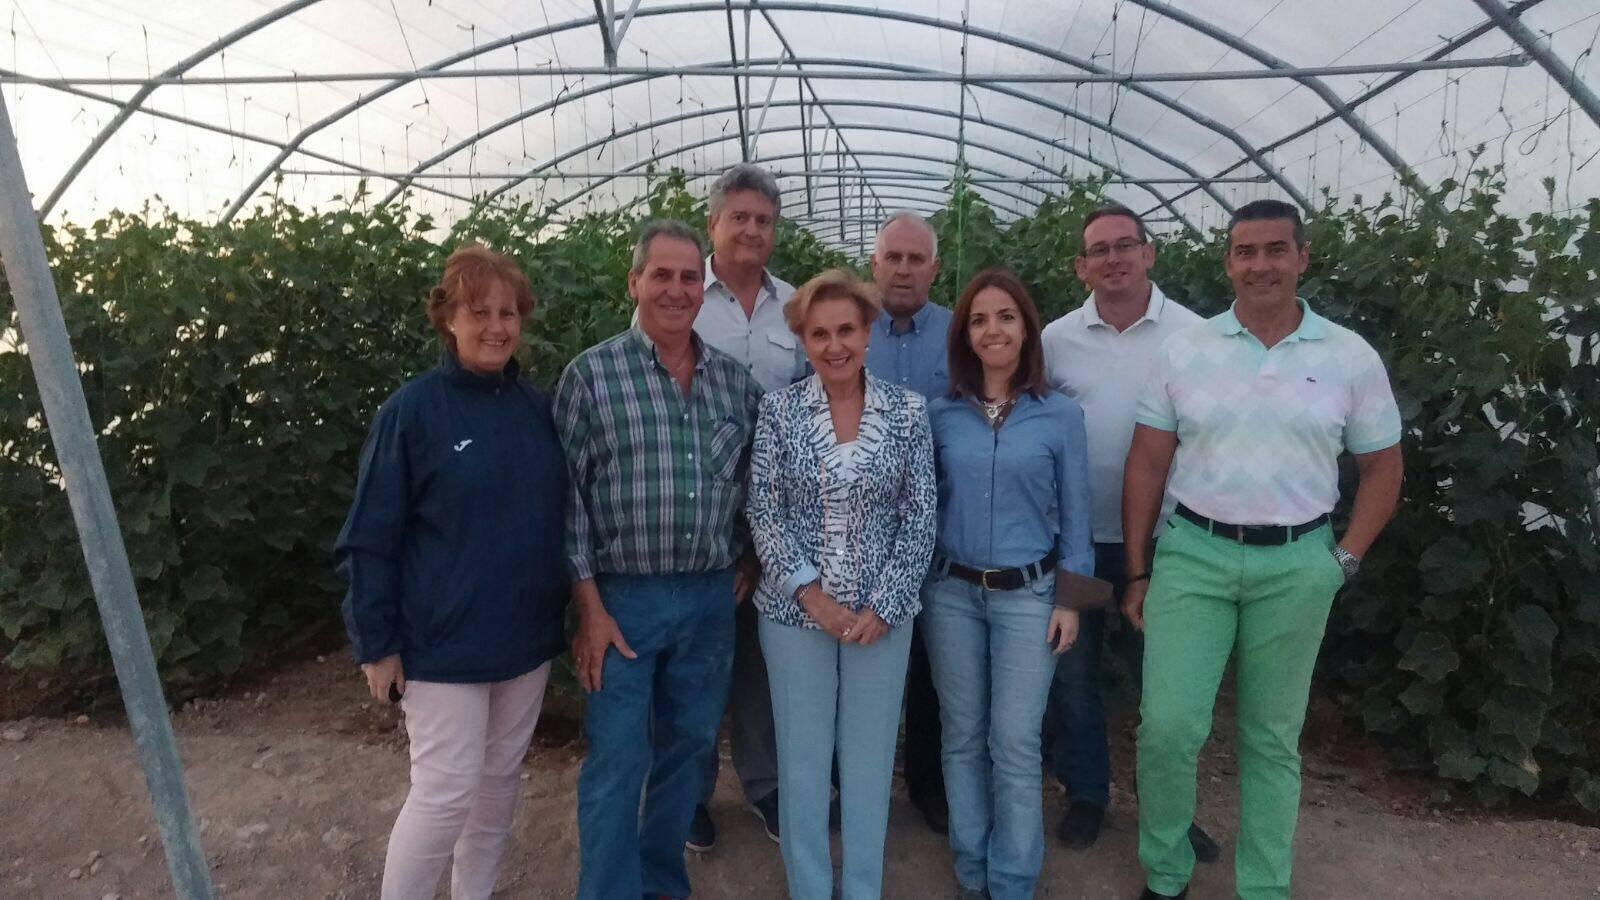 visita Carmen Quintanilla del Partido Popular a un invernadero de Herencia